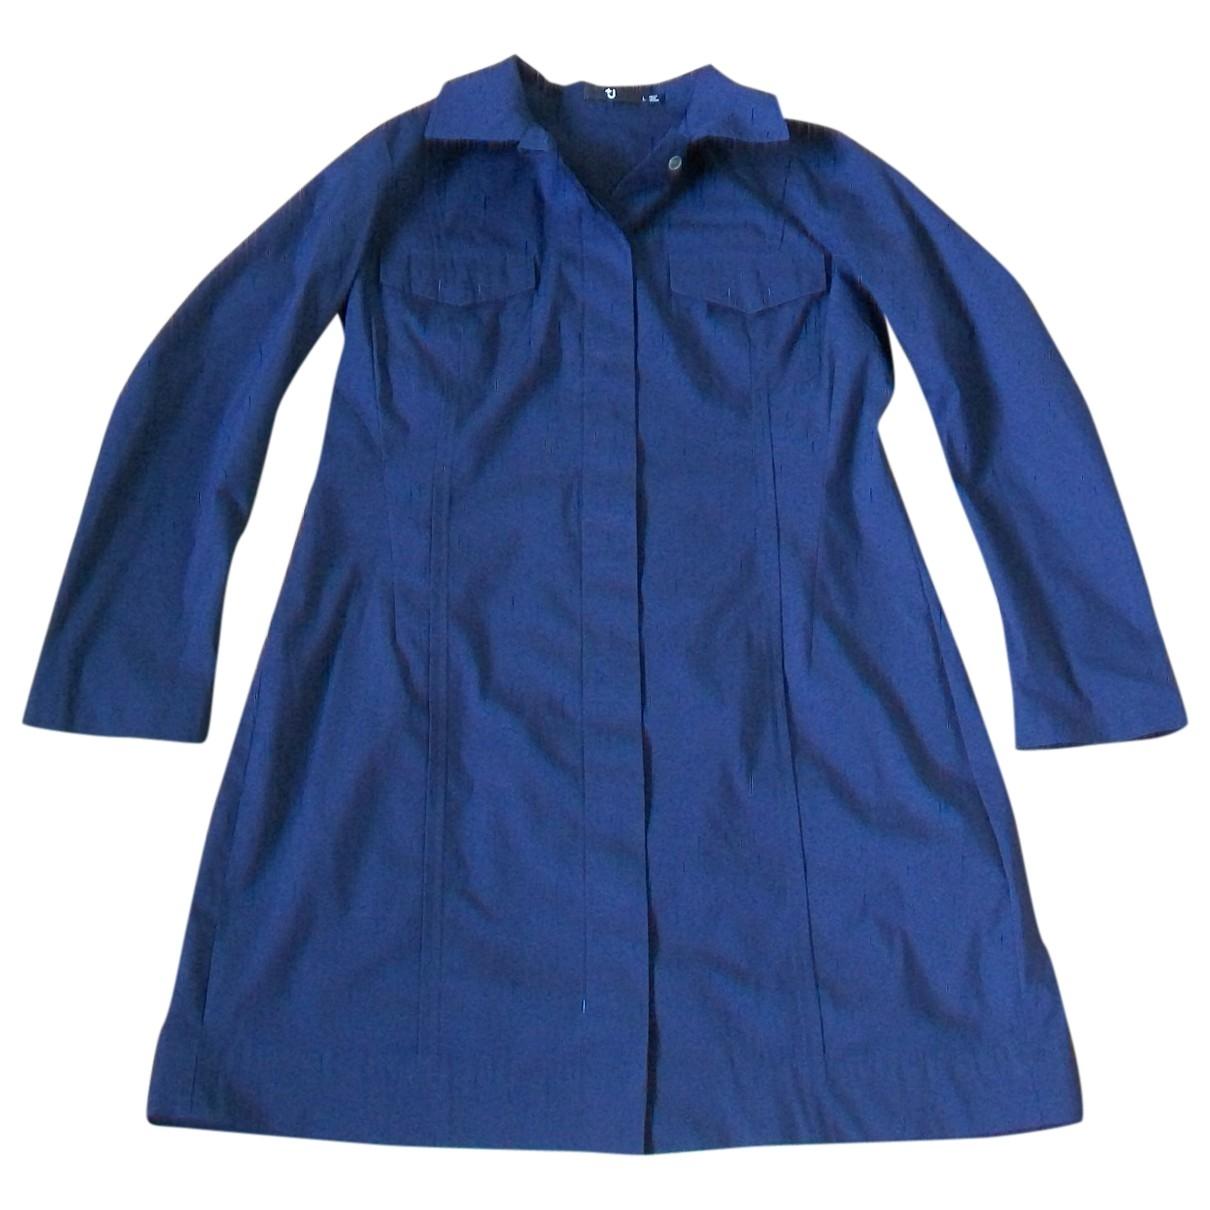 Uniqlo \N Navy Cotton dress for Women L International